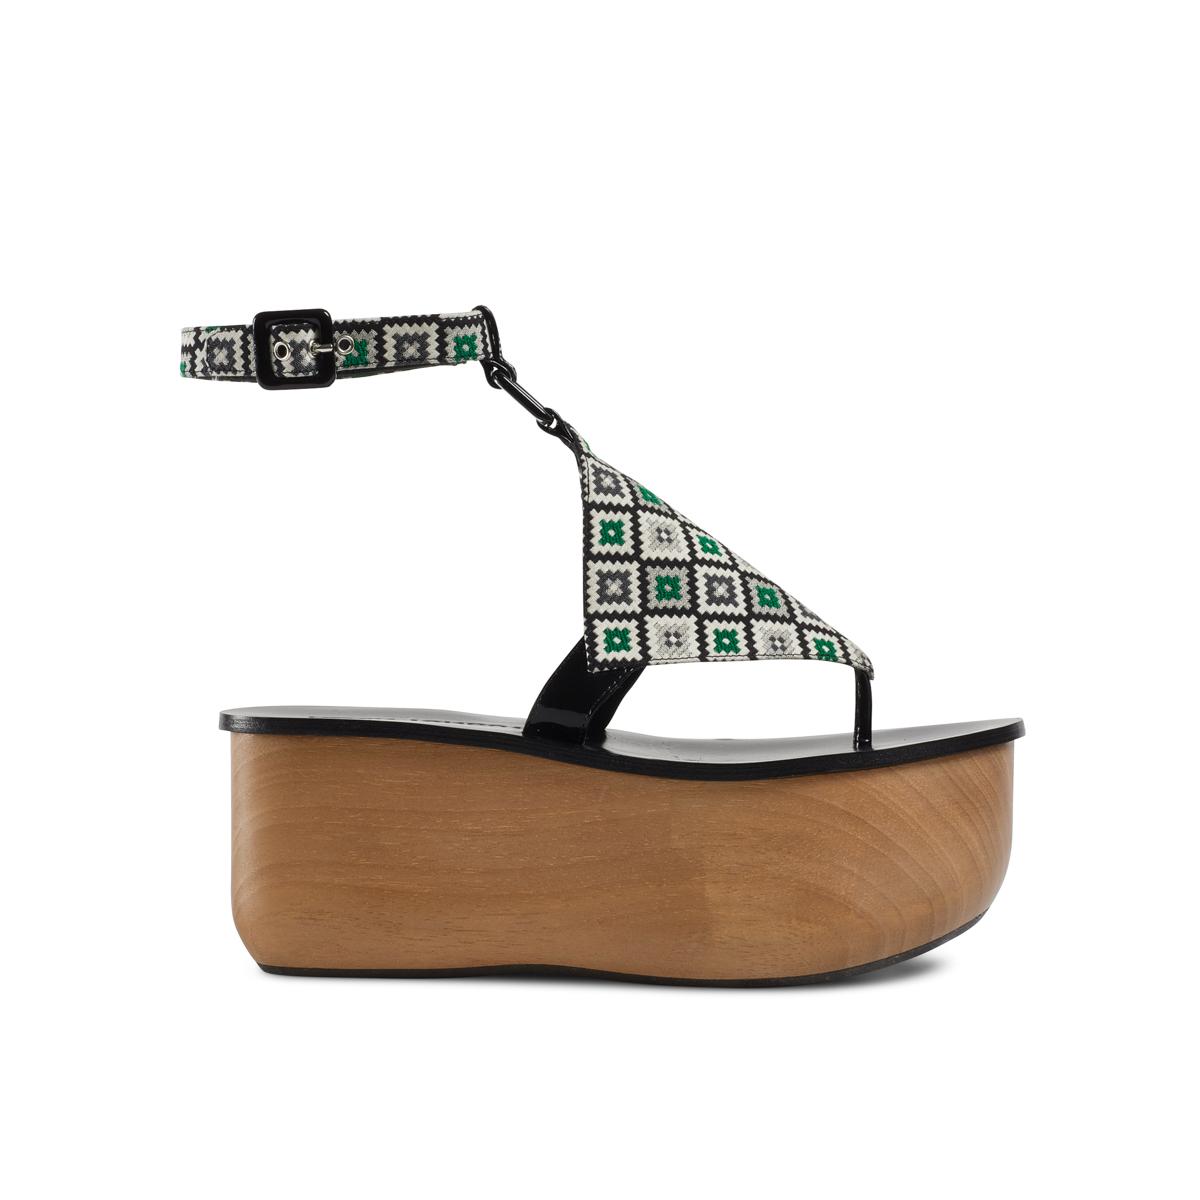 042_alaintondowski_springsummer2017_shoes_3023